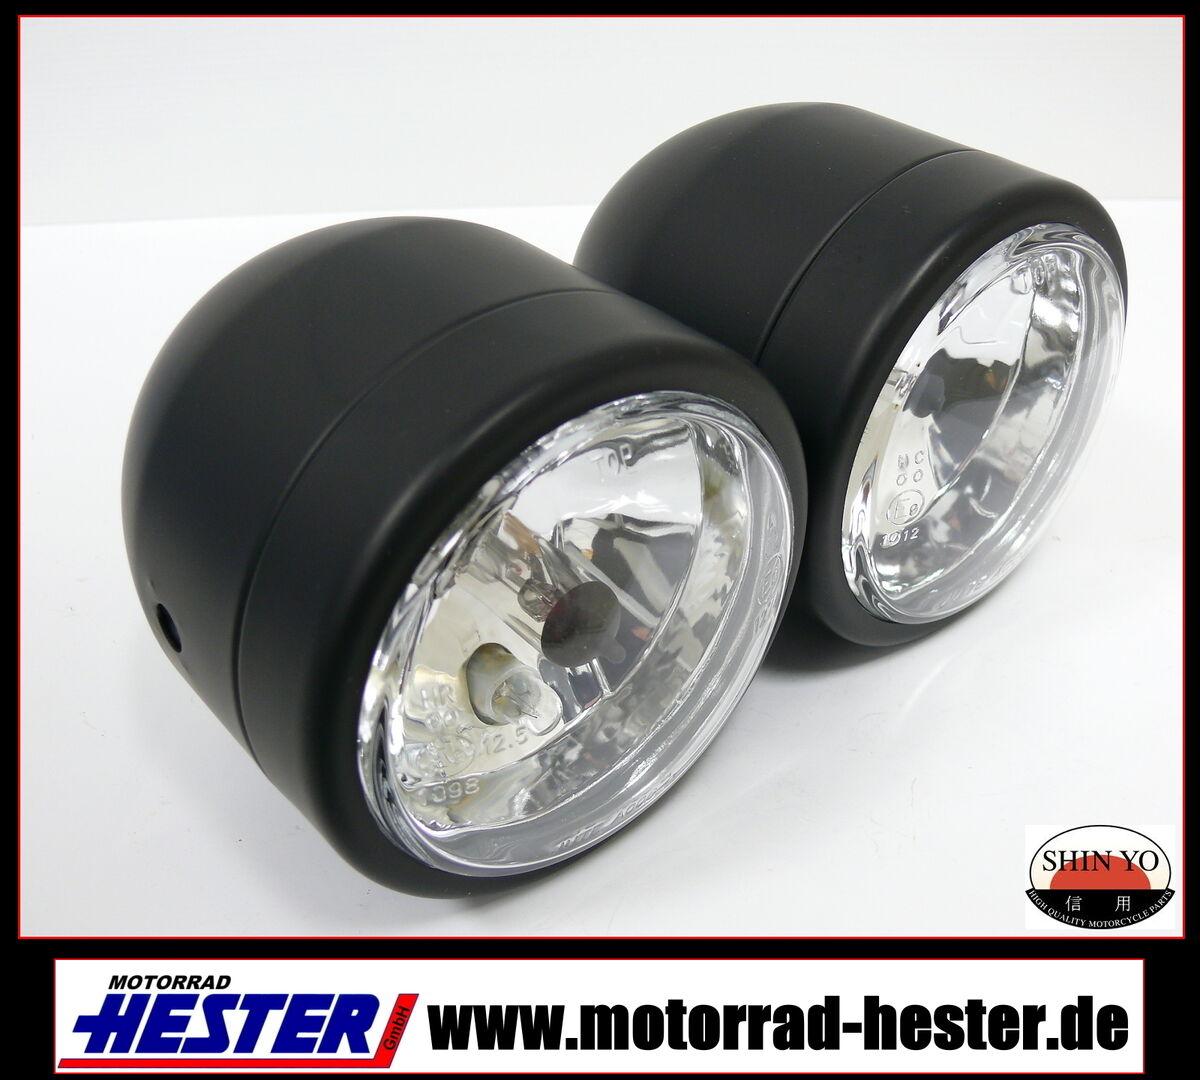 ,matt schwarz,H4,Triumph Speed Triple,955i,T 509,1050,S,R,